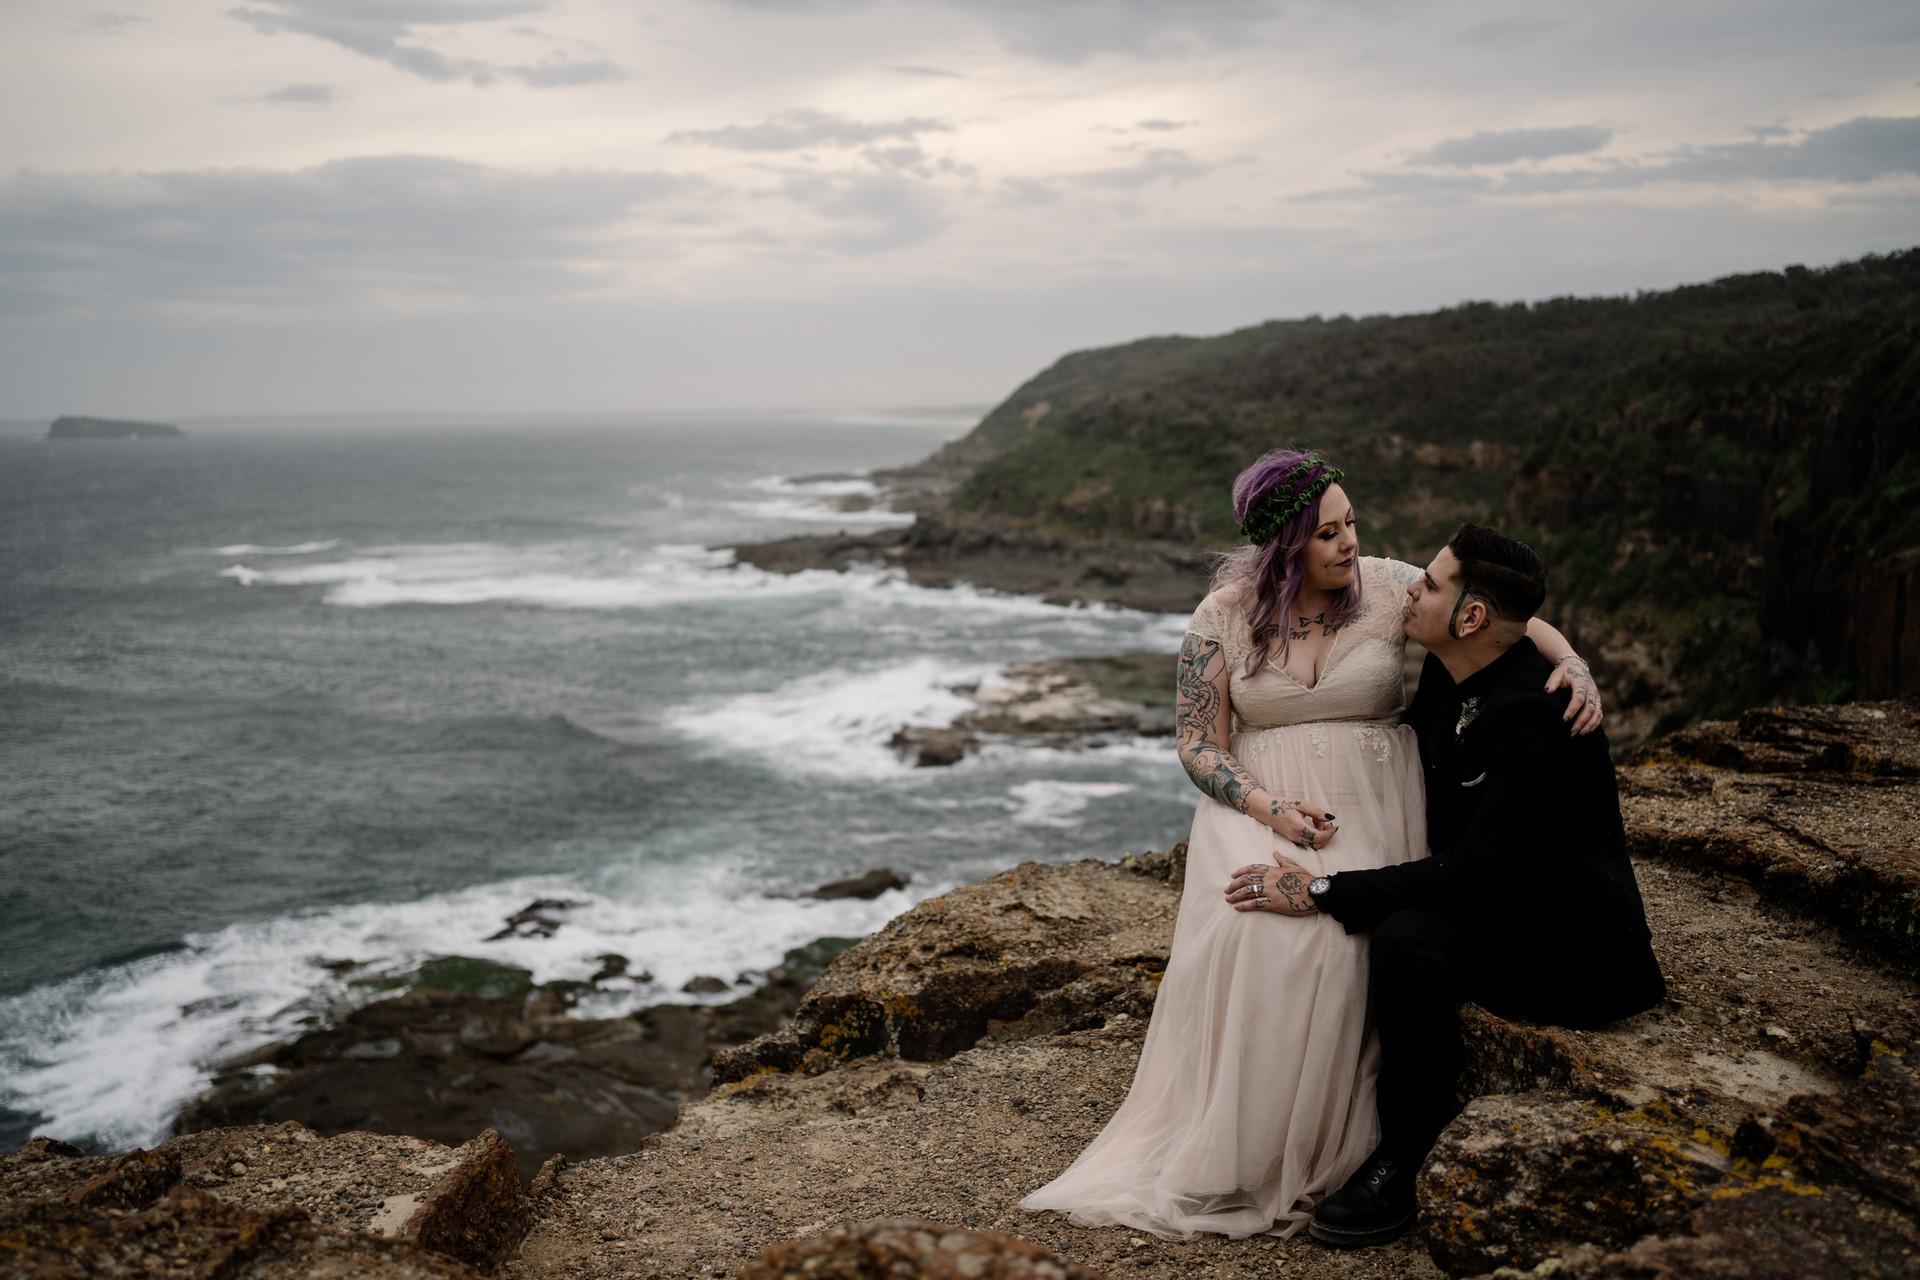 Bride sitting on groom's lap at beach